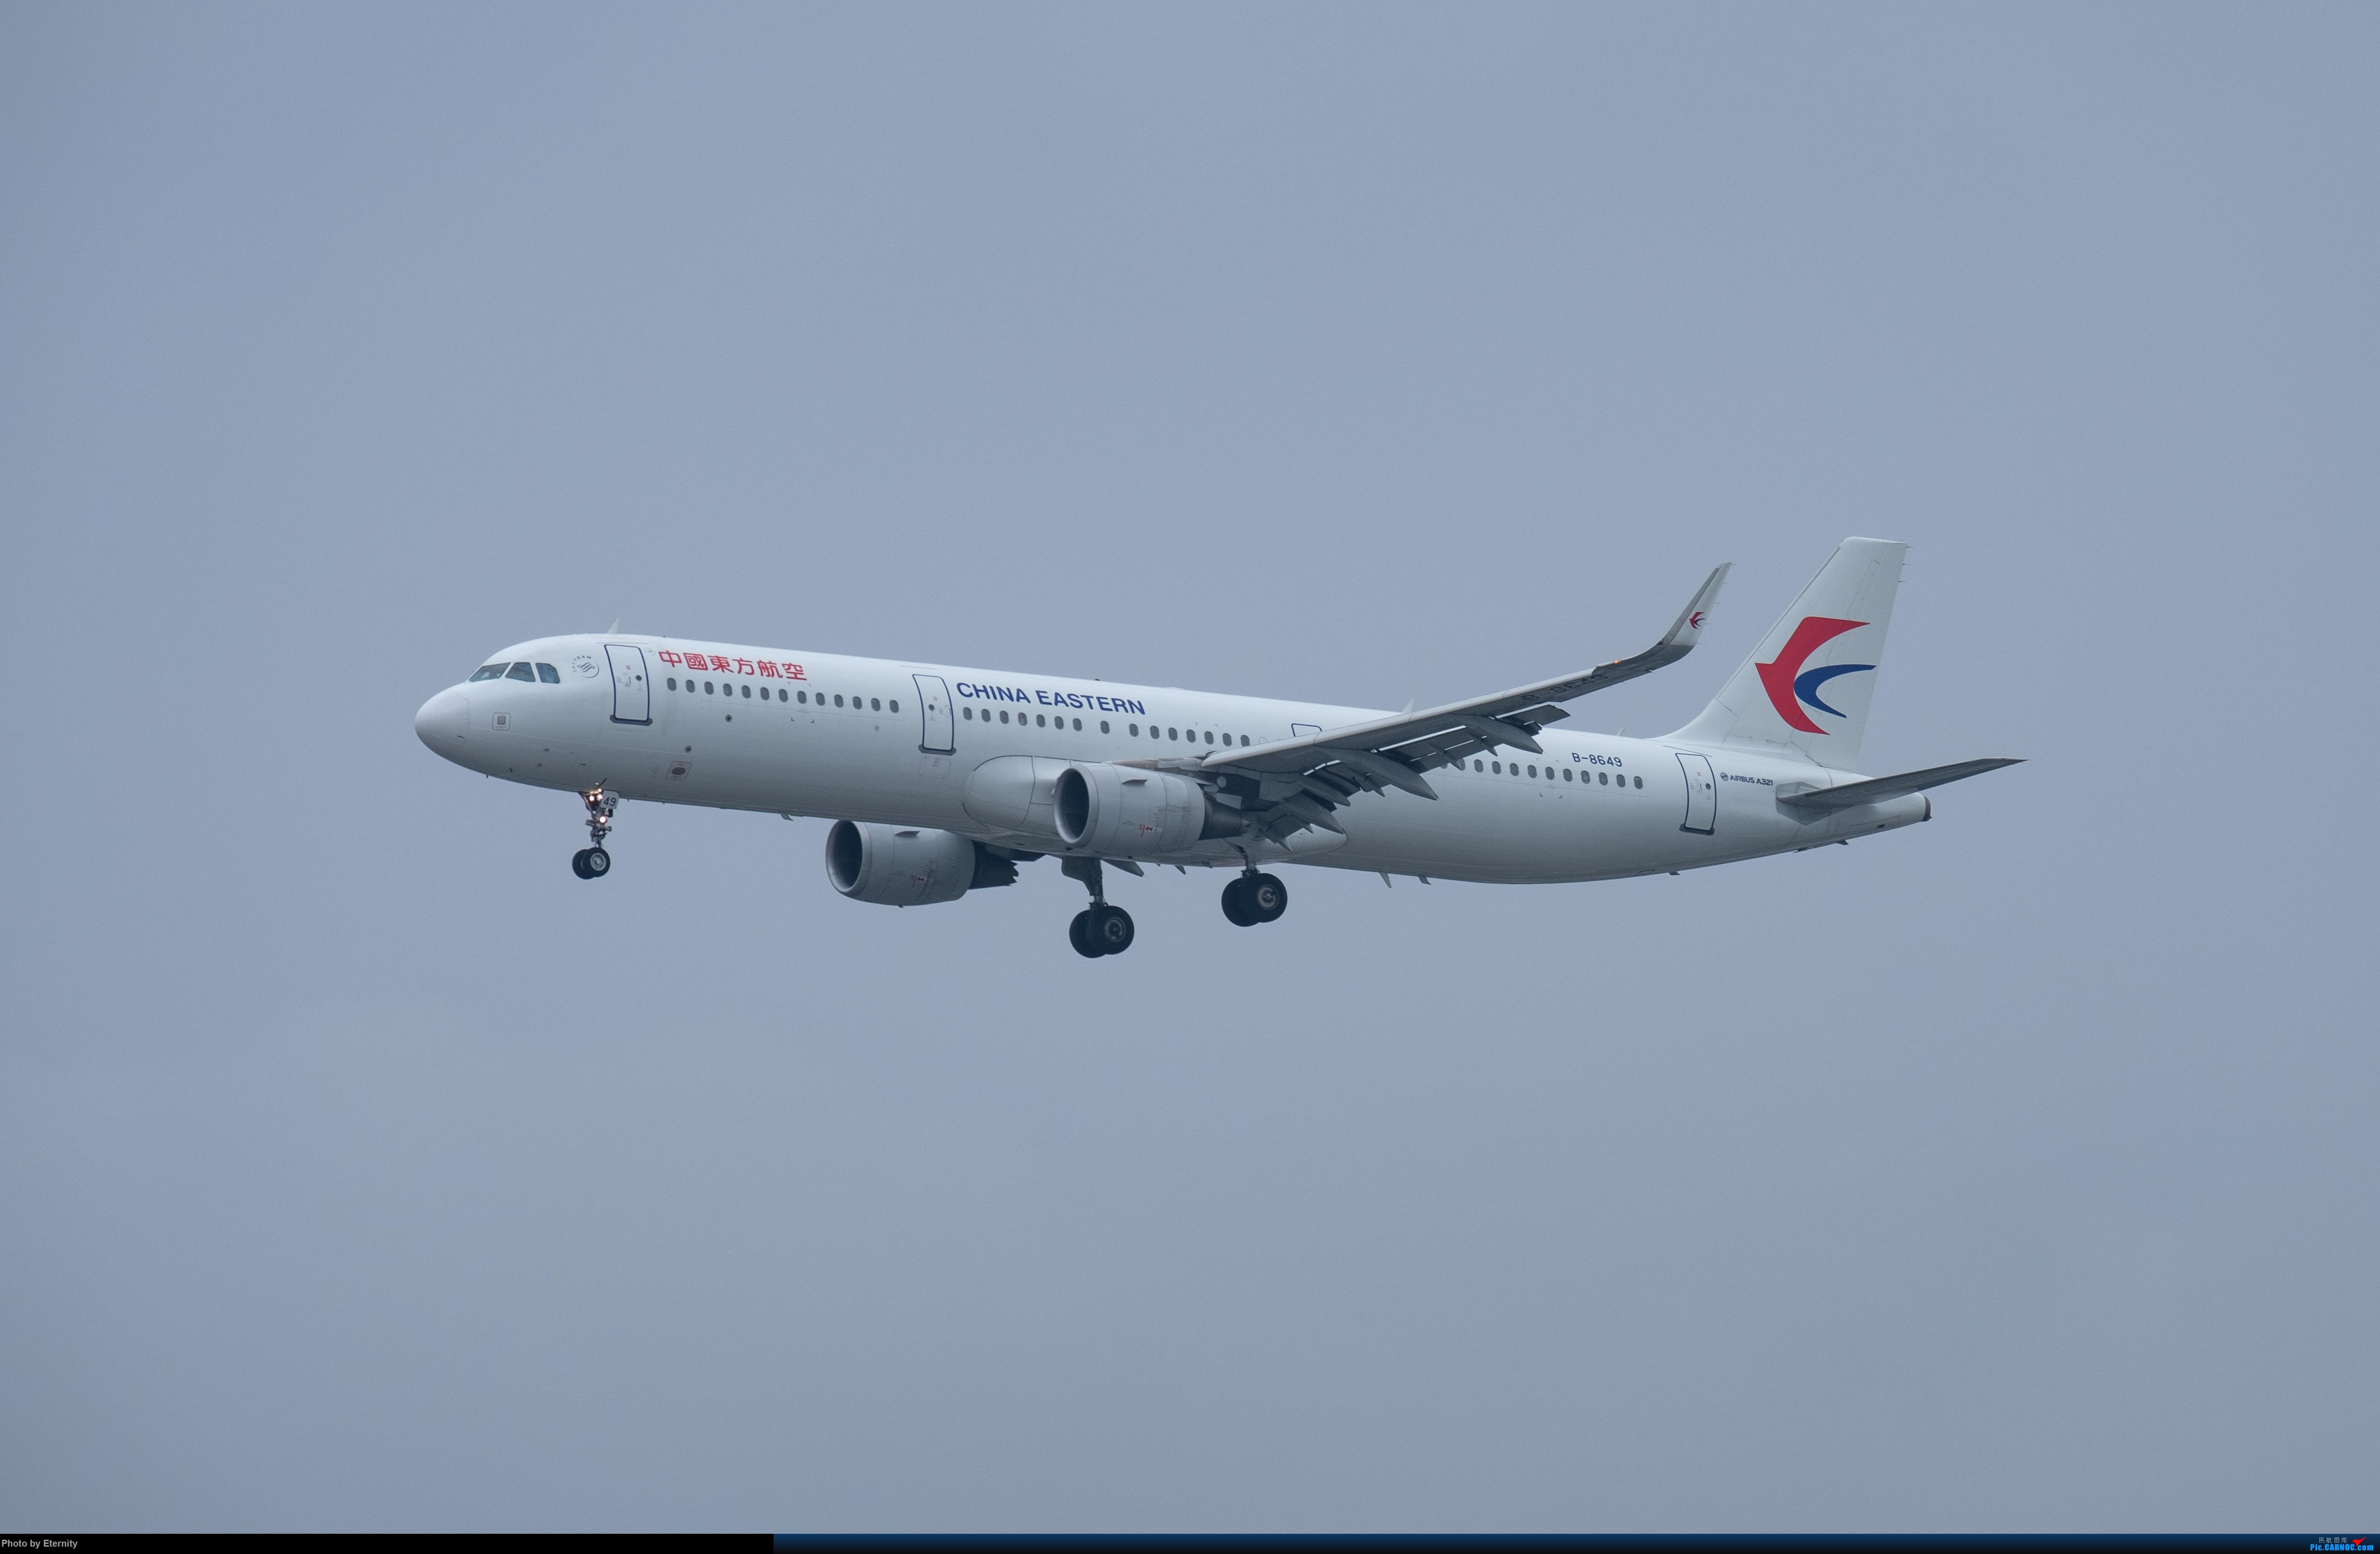 Re:[原创]后疫情期间的暑假国内游 | 西安-上海-广州-成都 | 体验国内3条干线 | 吉祥航空787 | 南航350 | 海航737 AIRBUS A321-200 B-8649 中国上海虹桥国际机场